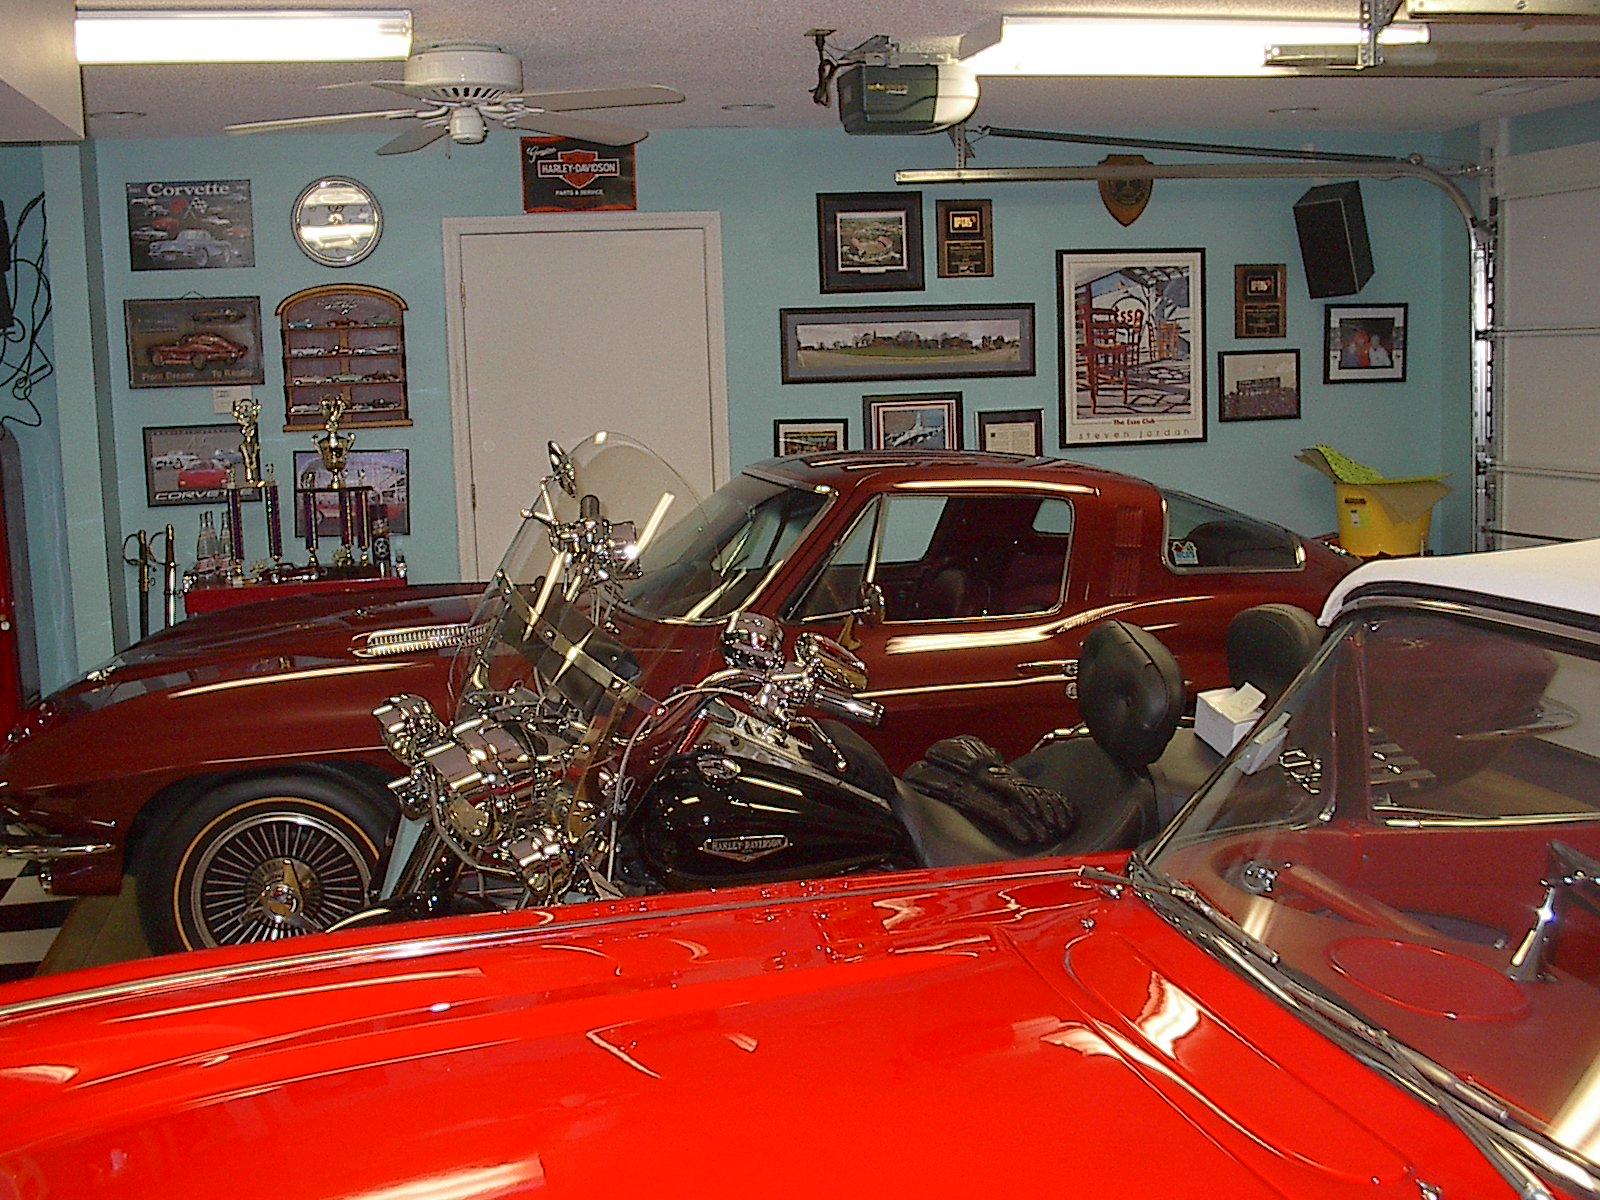 Ron and his Retro Garage